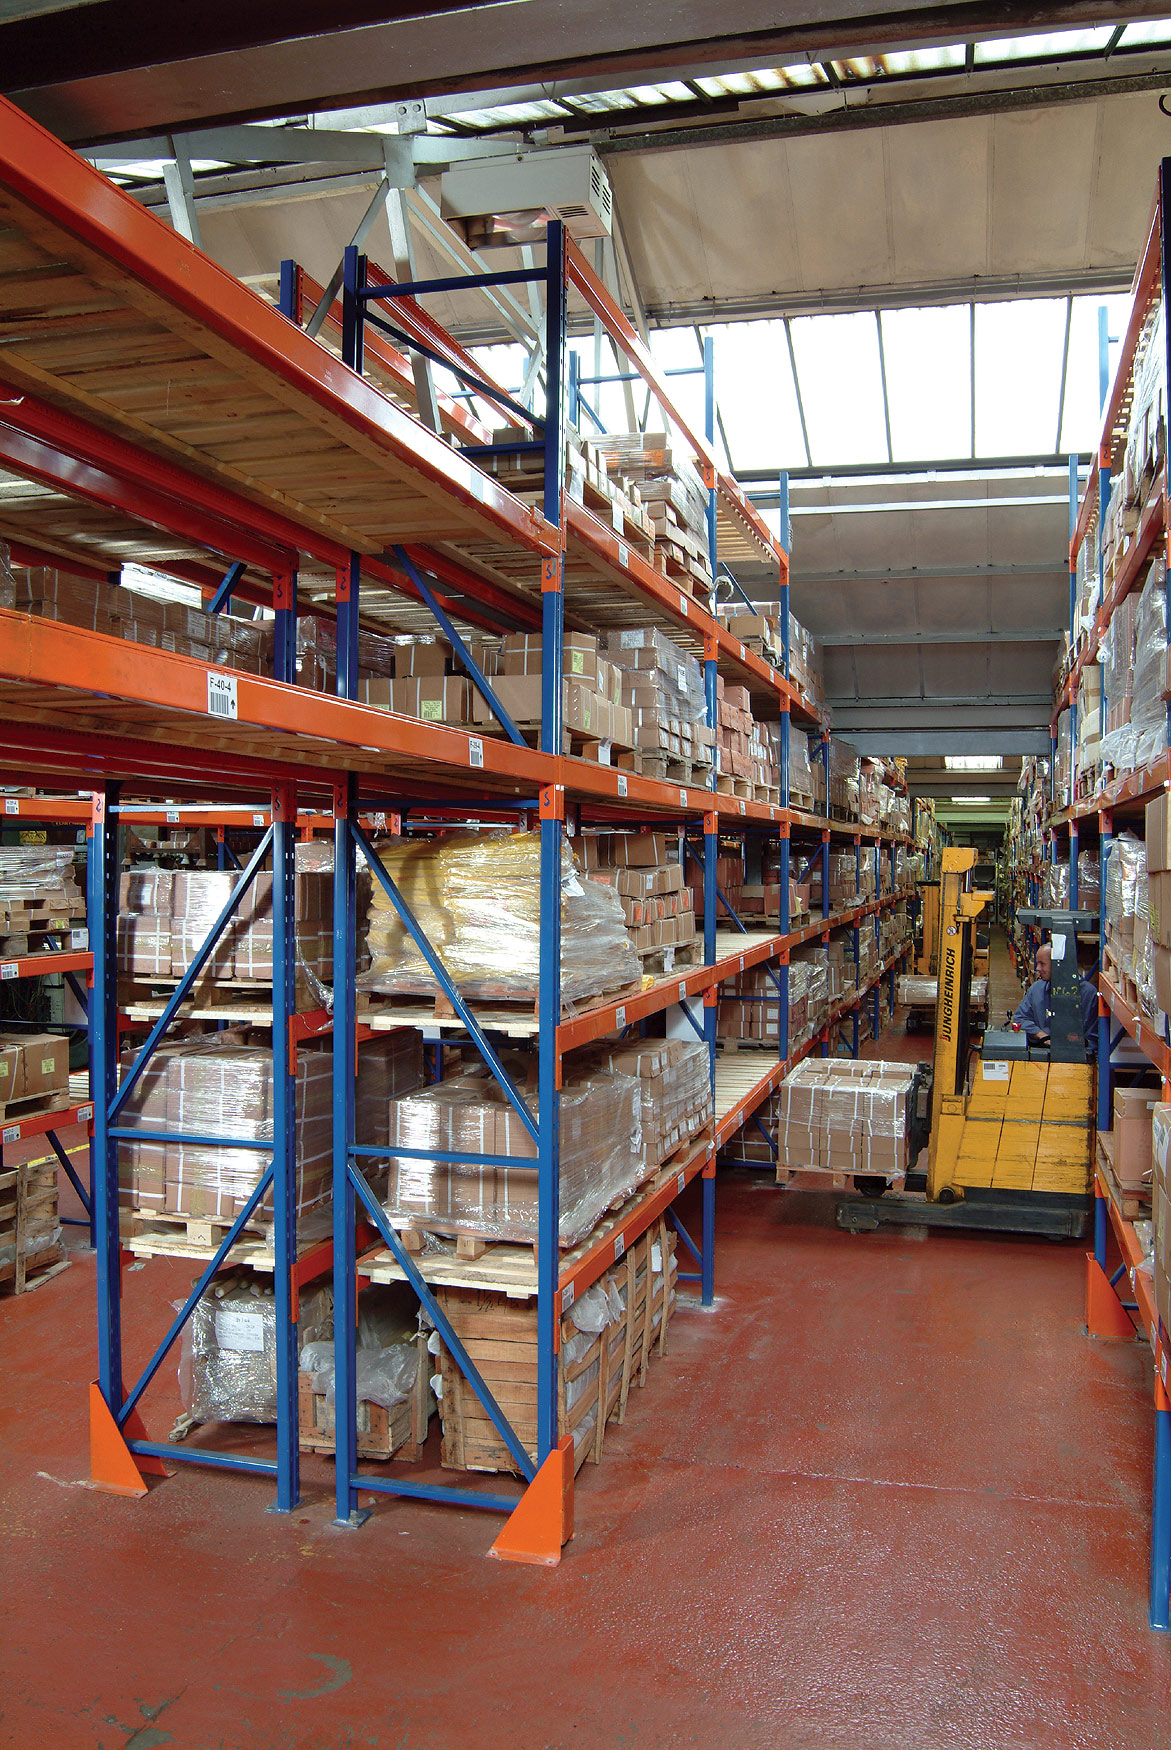 Redirack Heavy Duty Pallet Racks manufactured in the UK